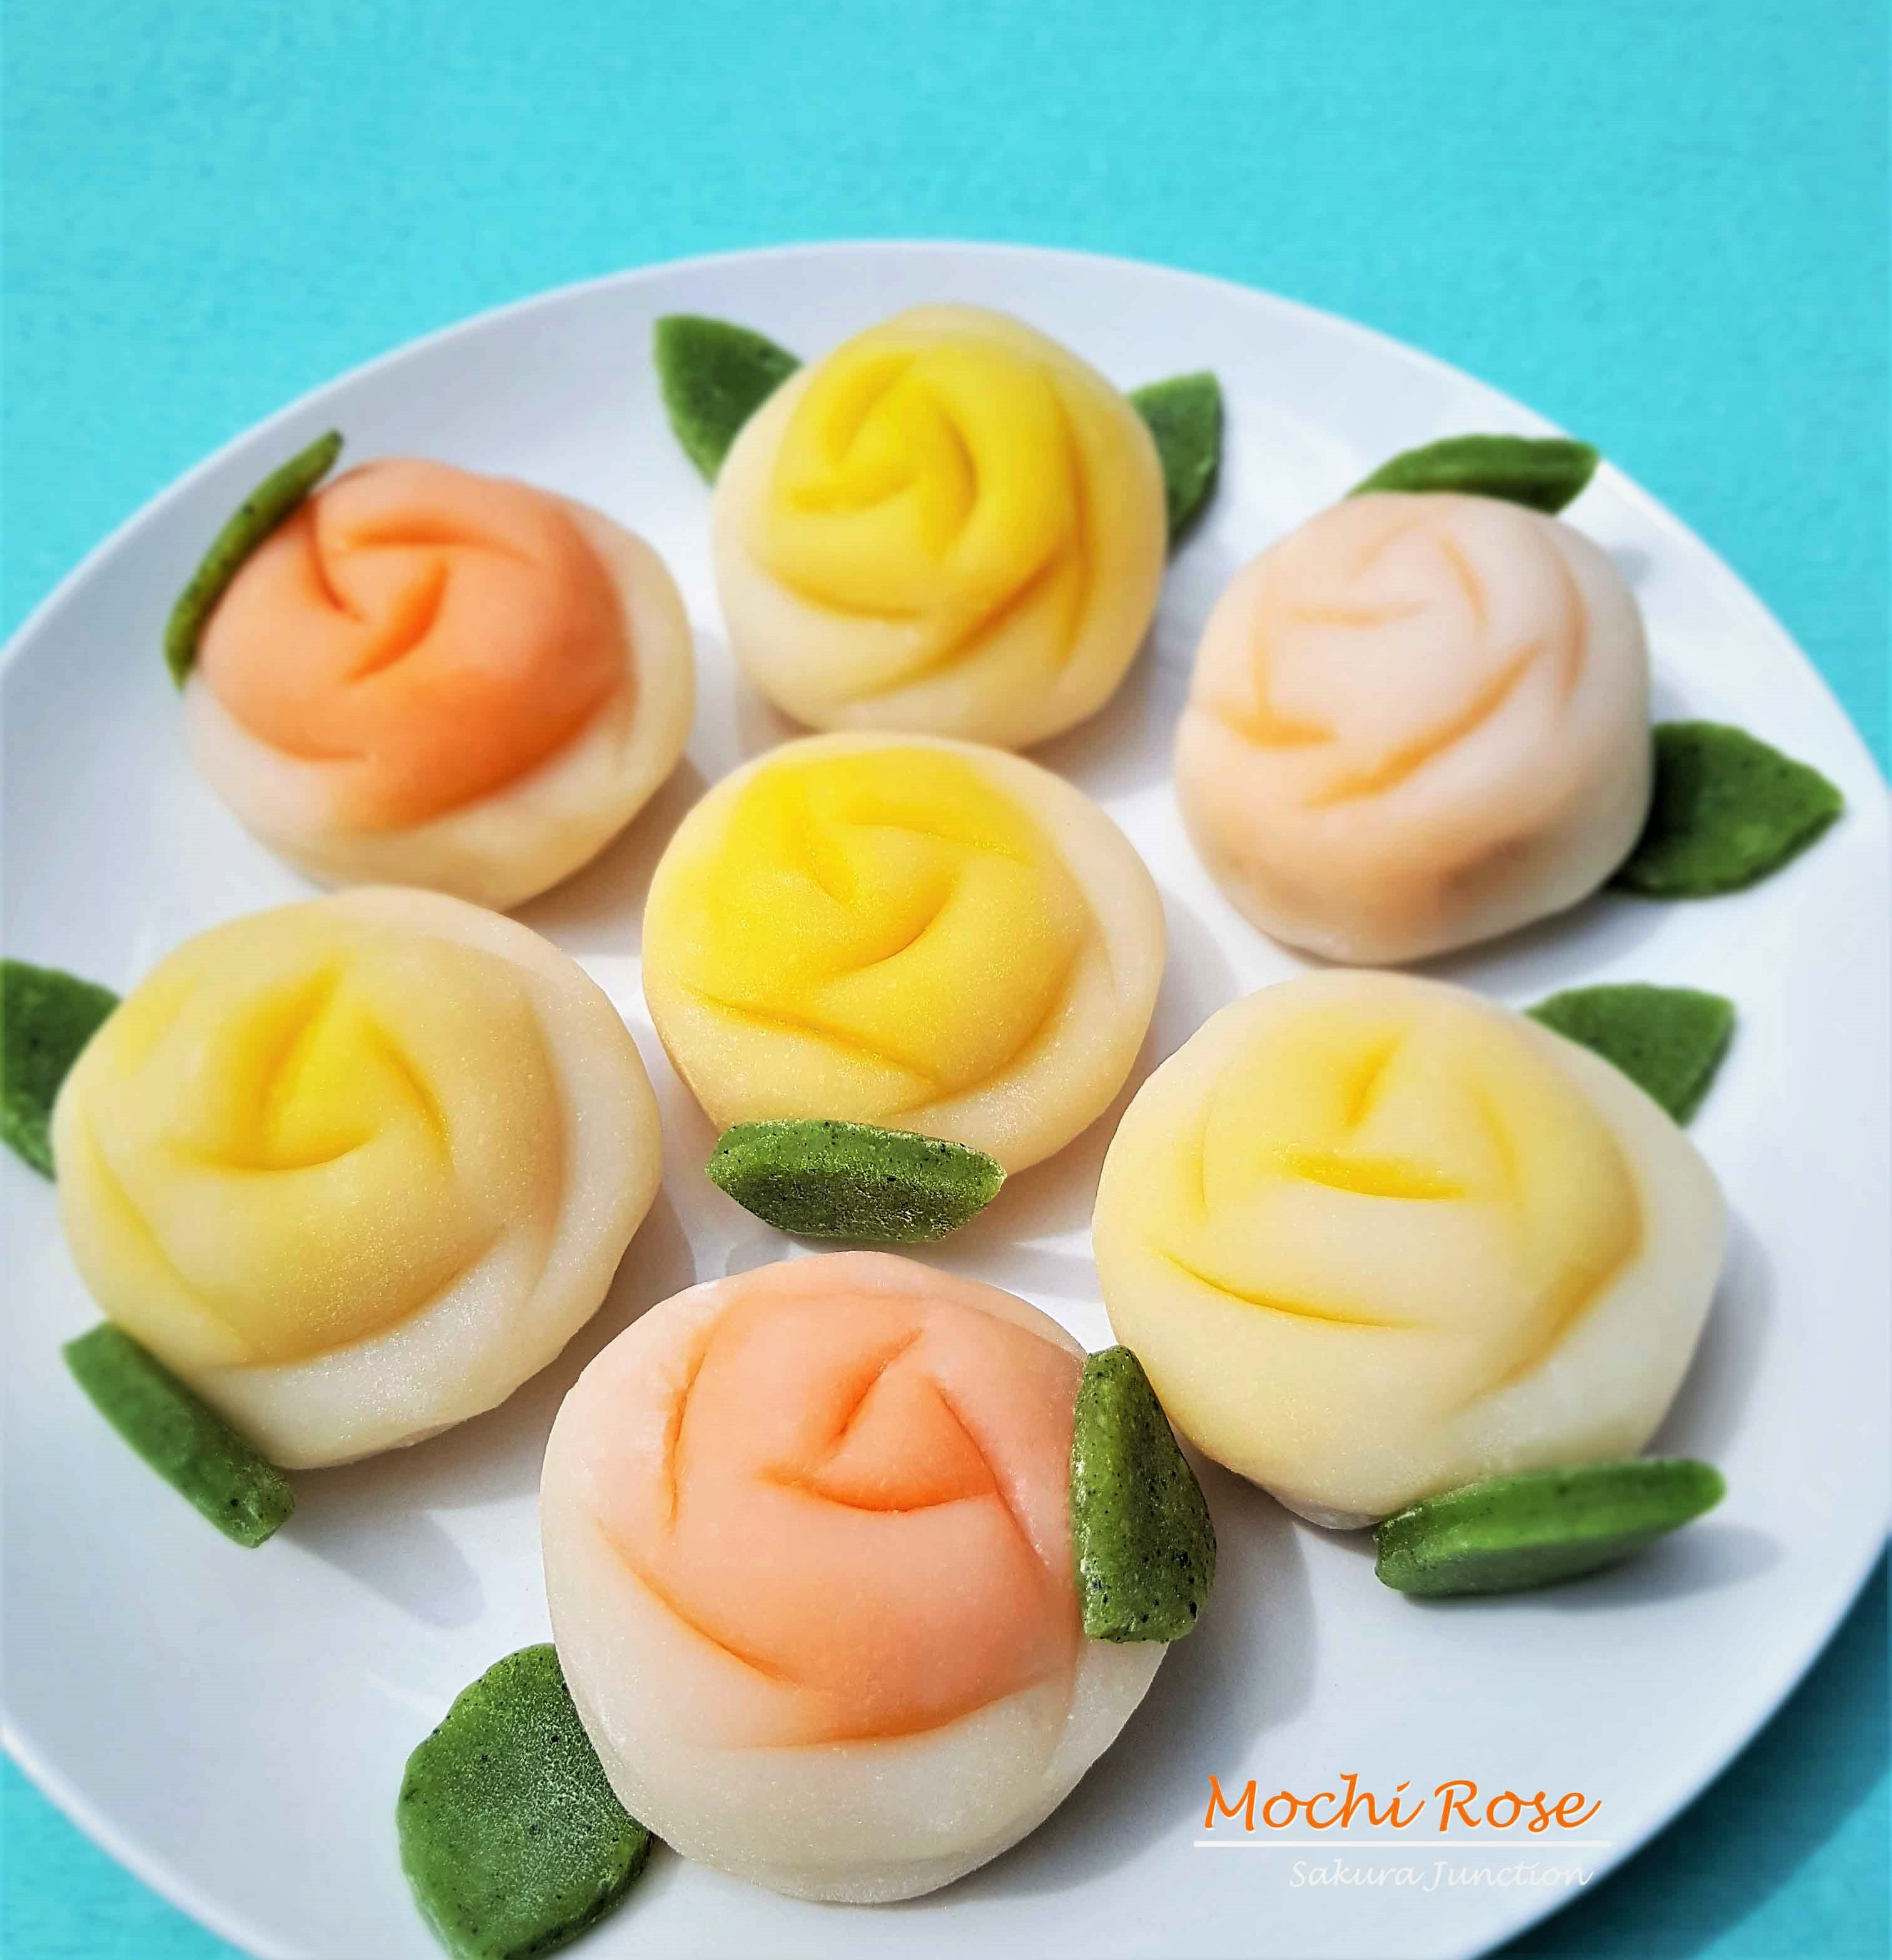 Mochi Rose4